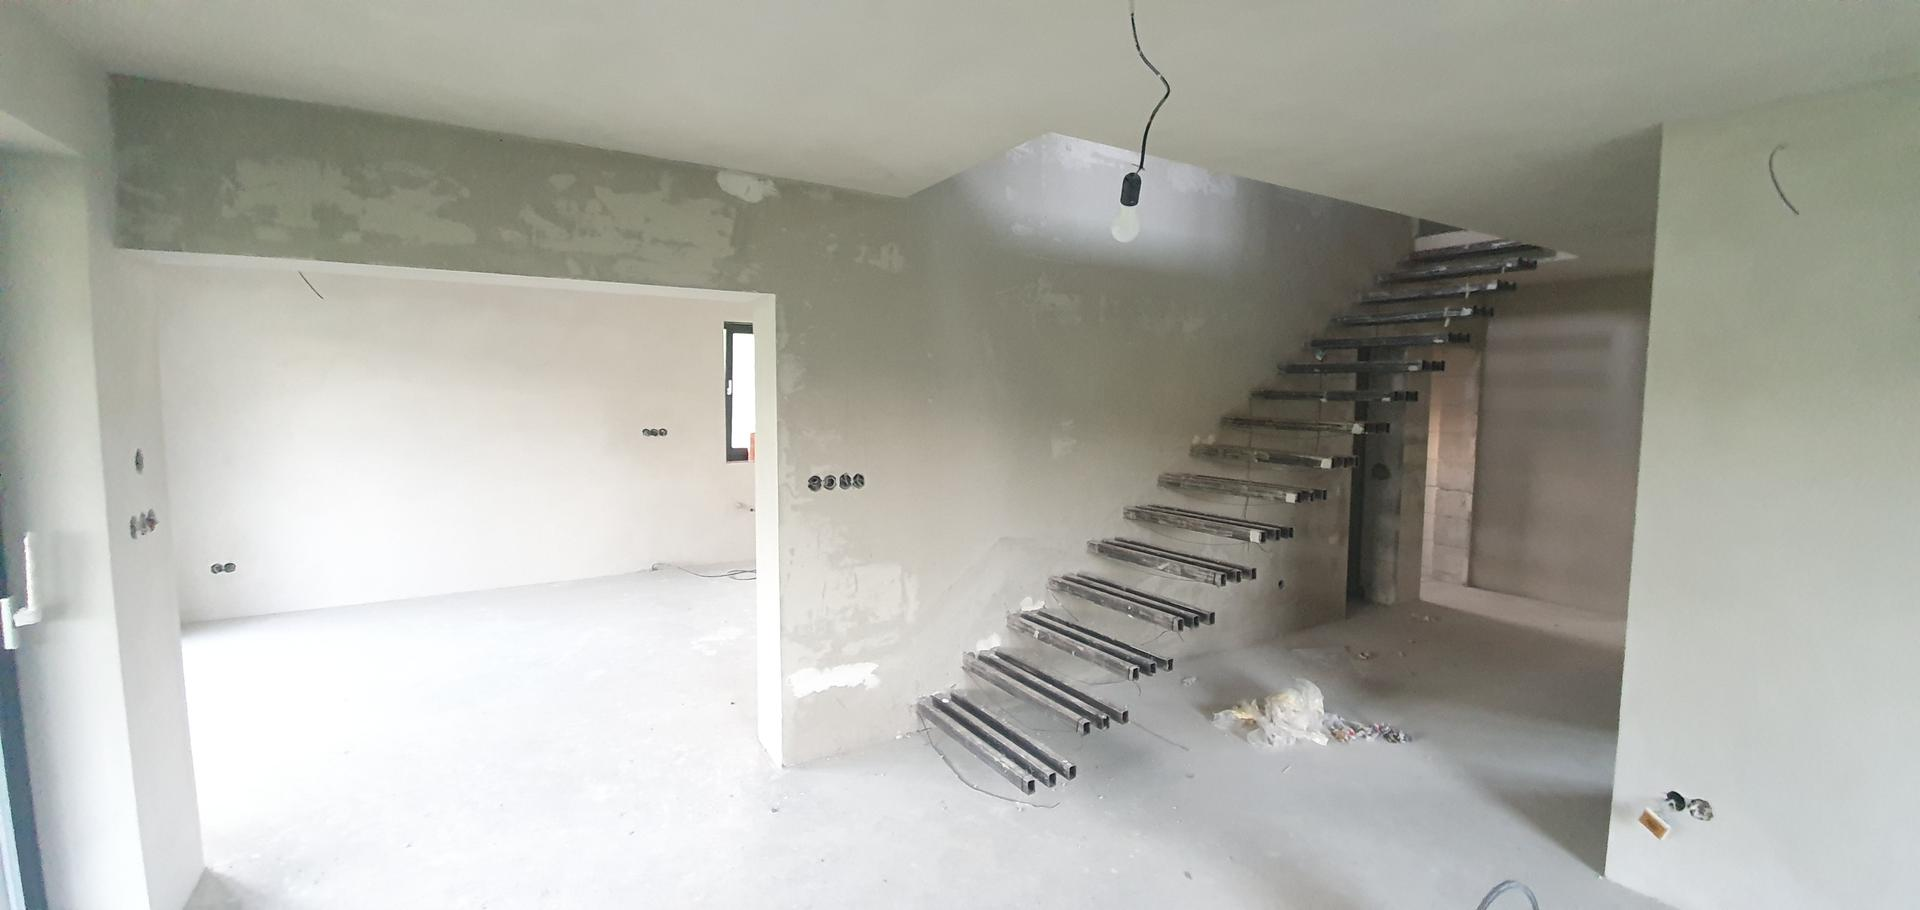 Konzolove schodisko (samonosne schody) - Stena pripravena na dekoracnu omietku